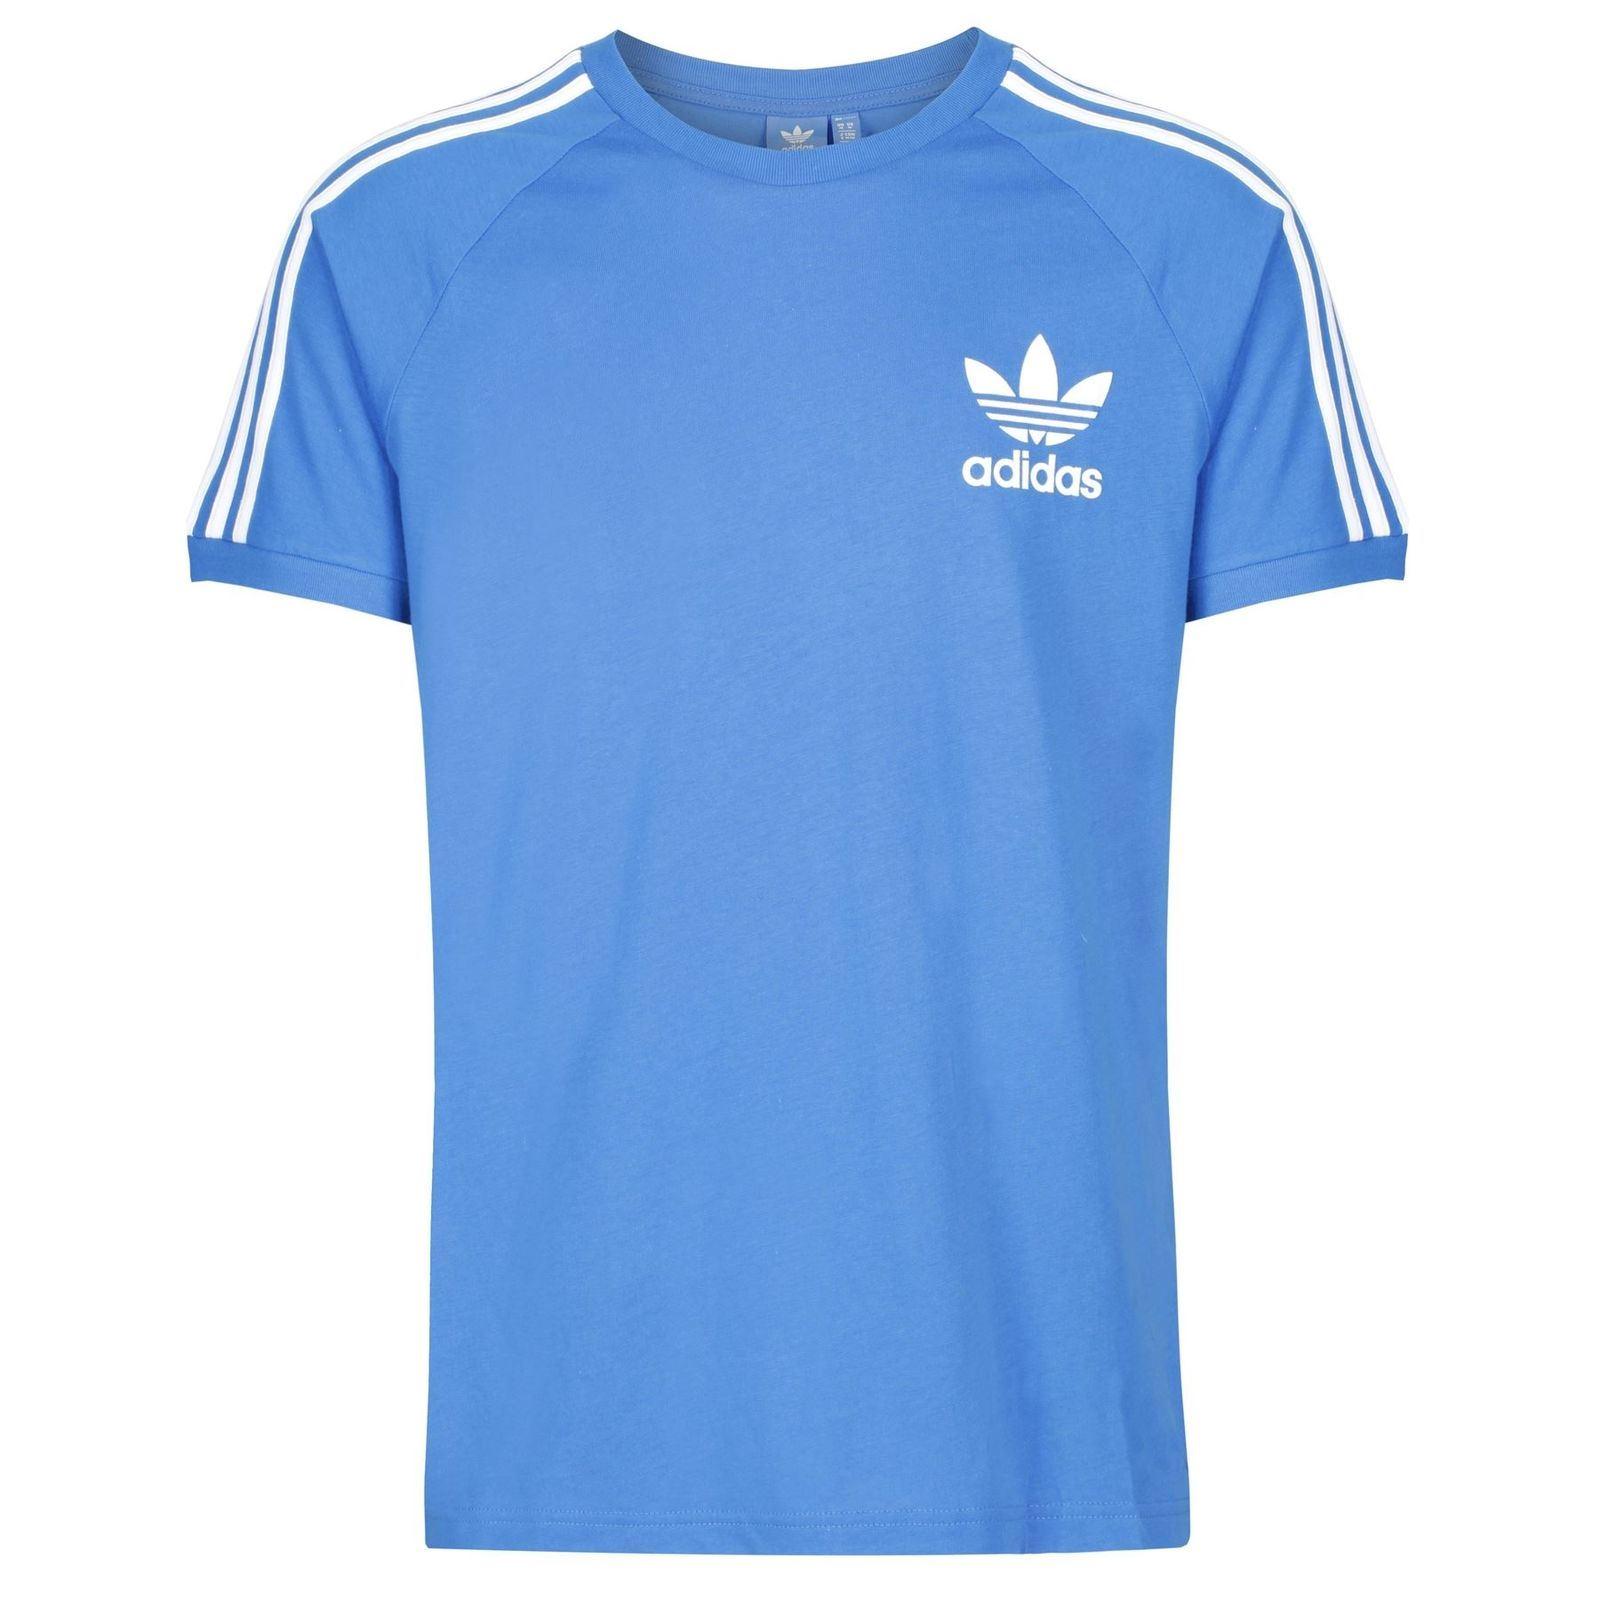 Adidas-Originals-California-T-Shirt-homme-a-encolure-ras-du-cou-haut-bleu-blanc-gris-bleu-marine miniature 5